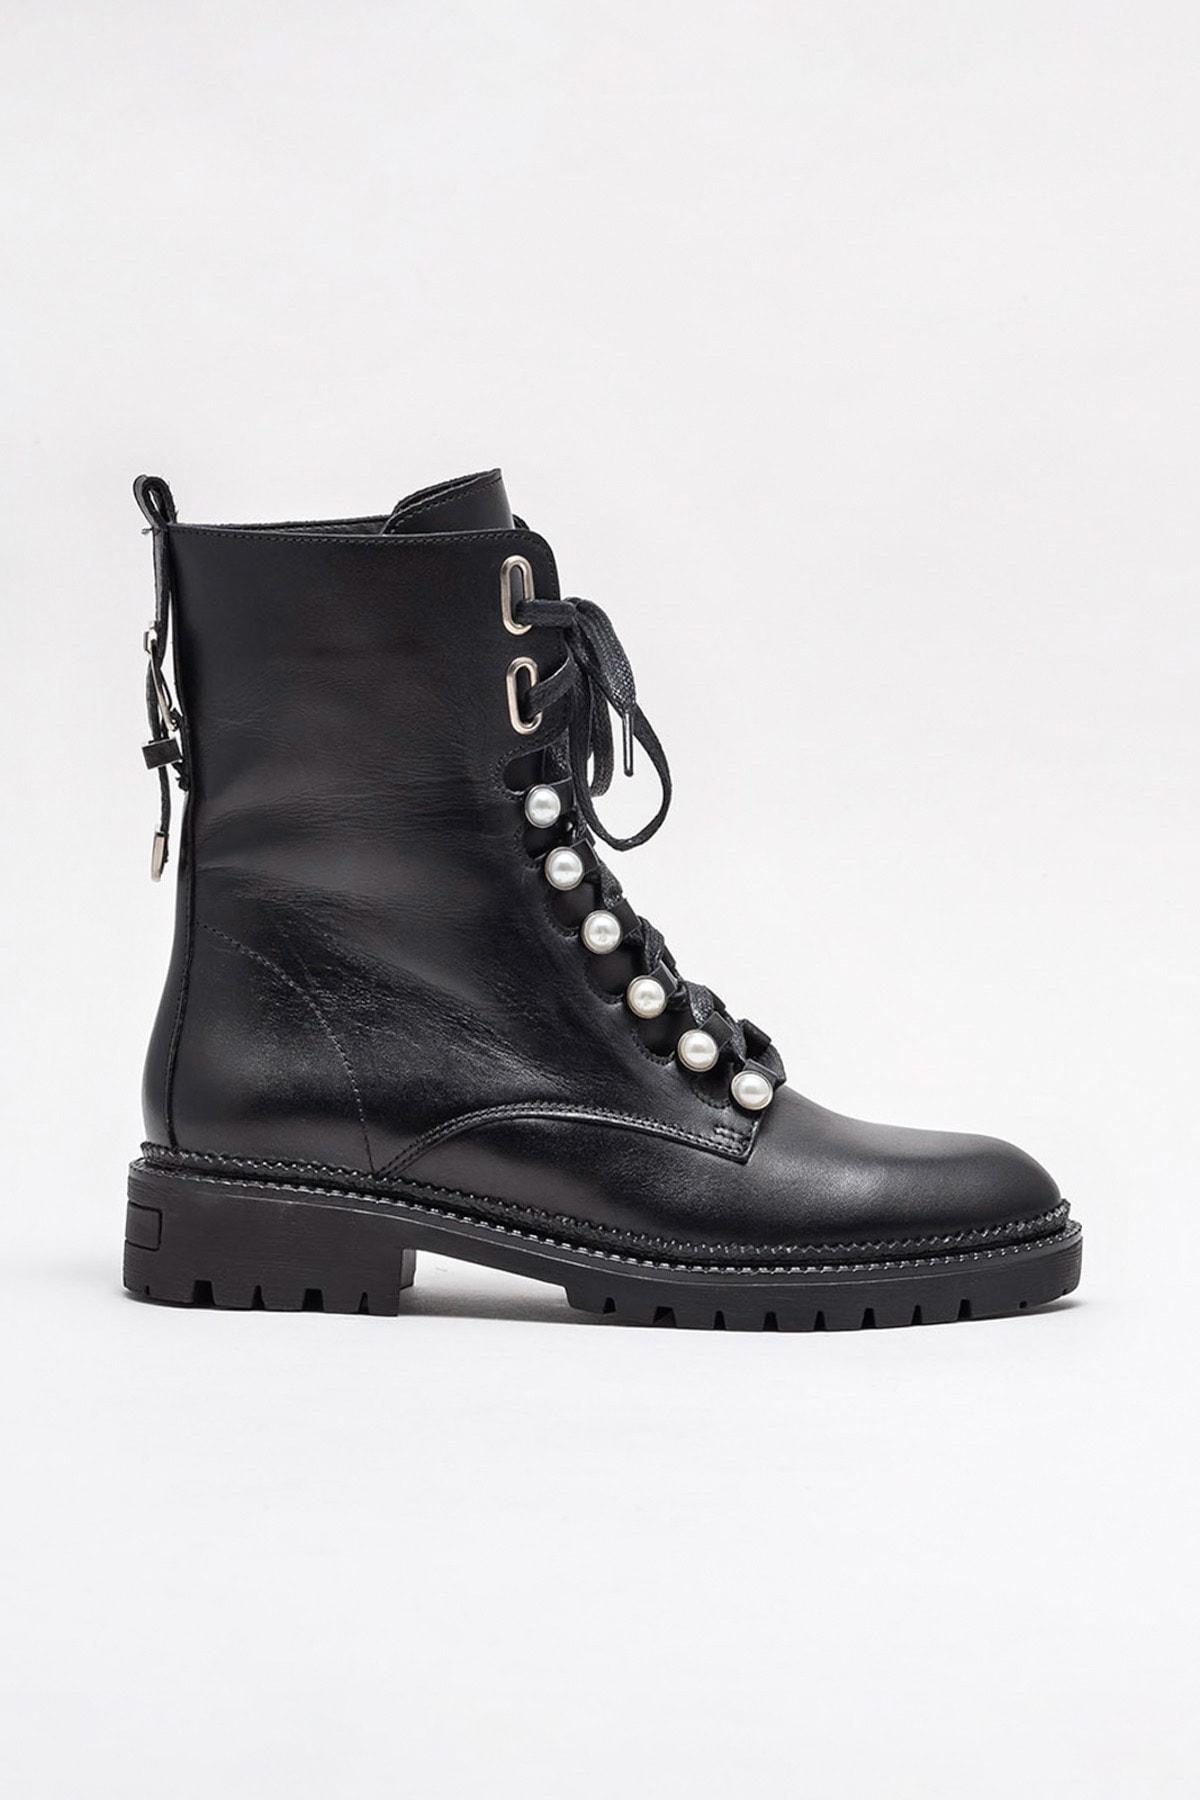 Elle Shoes Kadın Bot & Bootie Adaran 20KZA0545-184 1